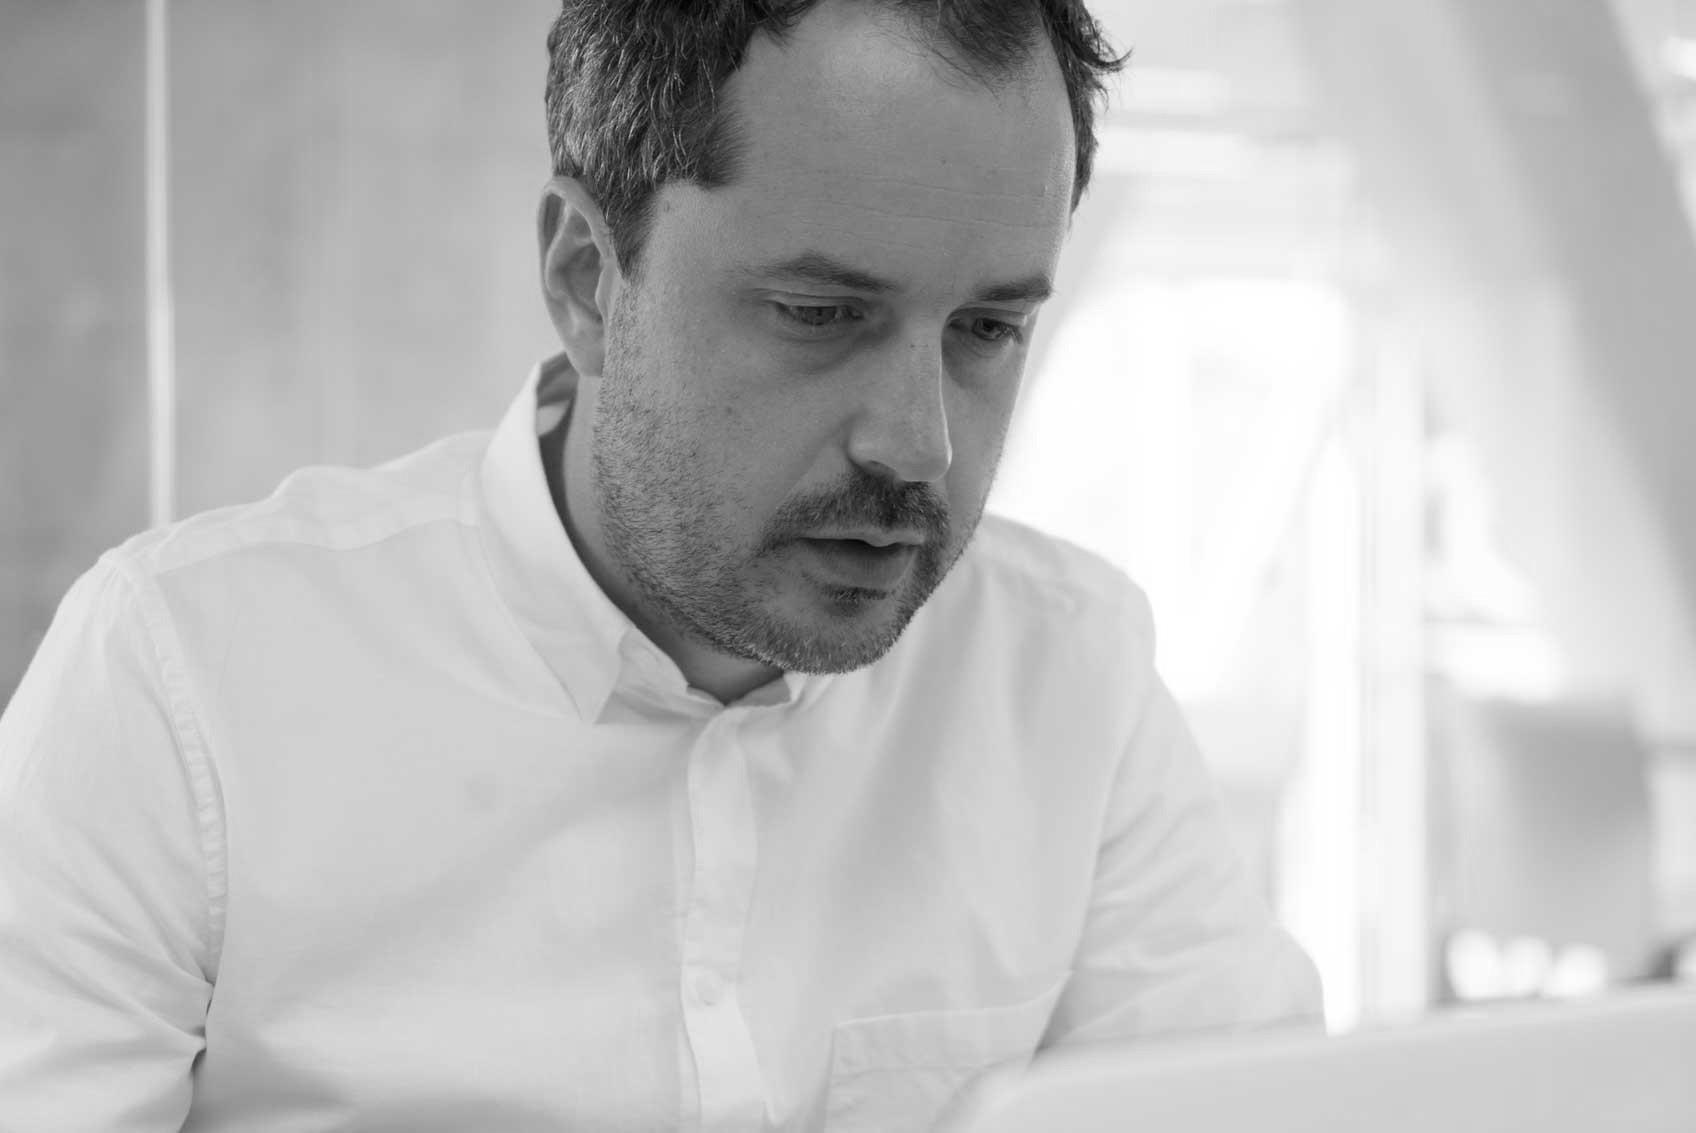 Matthias Van den Avont